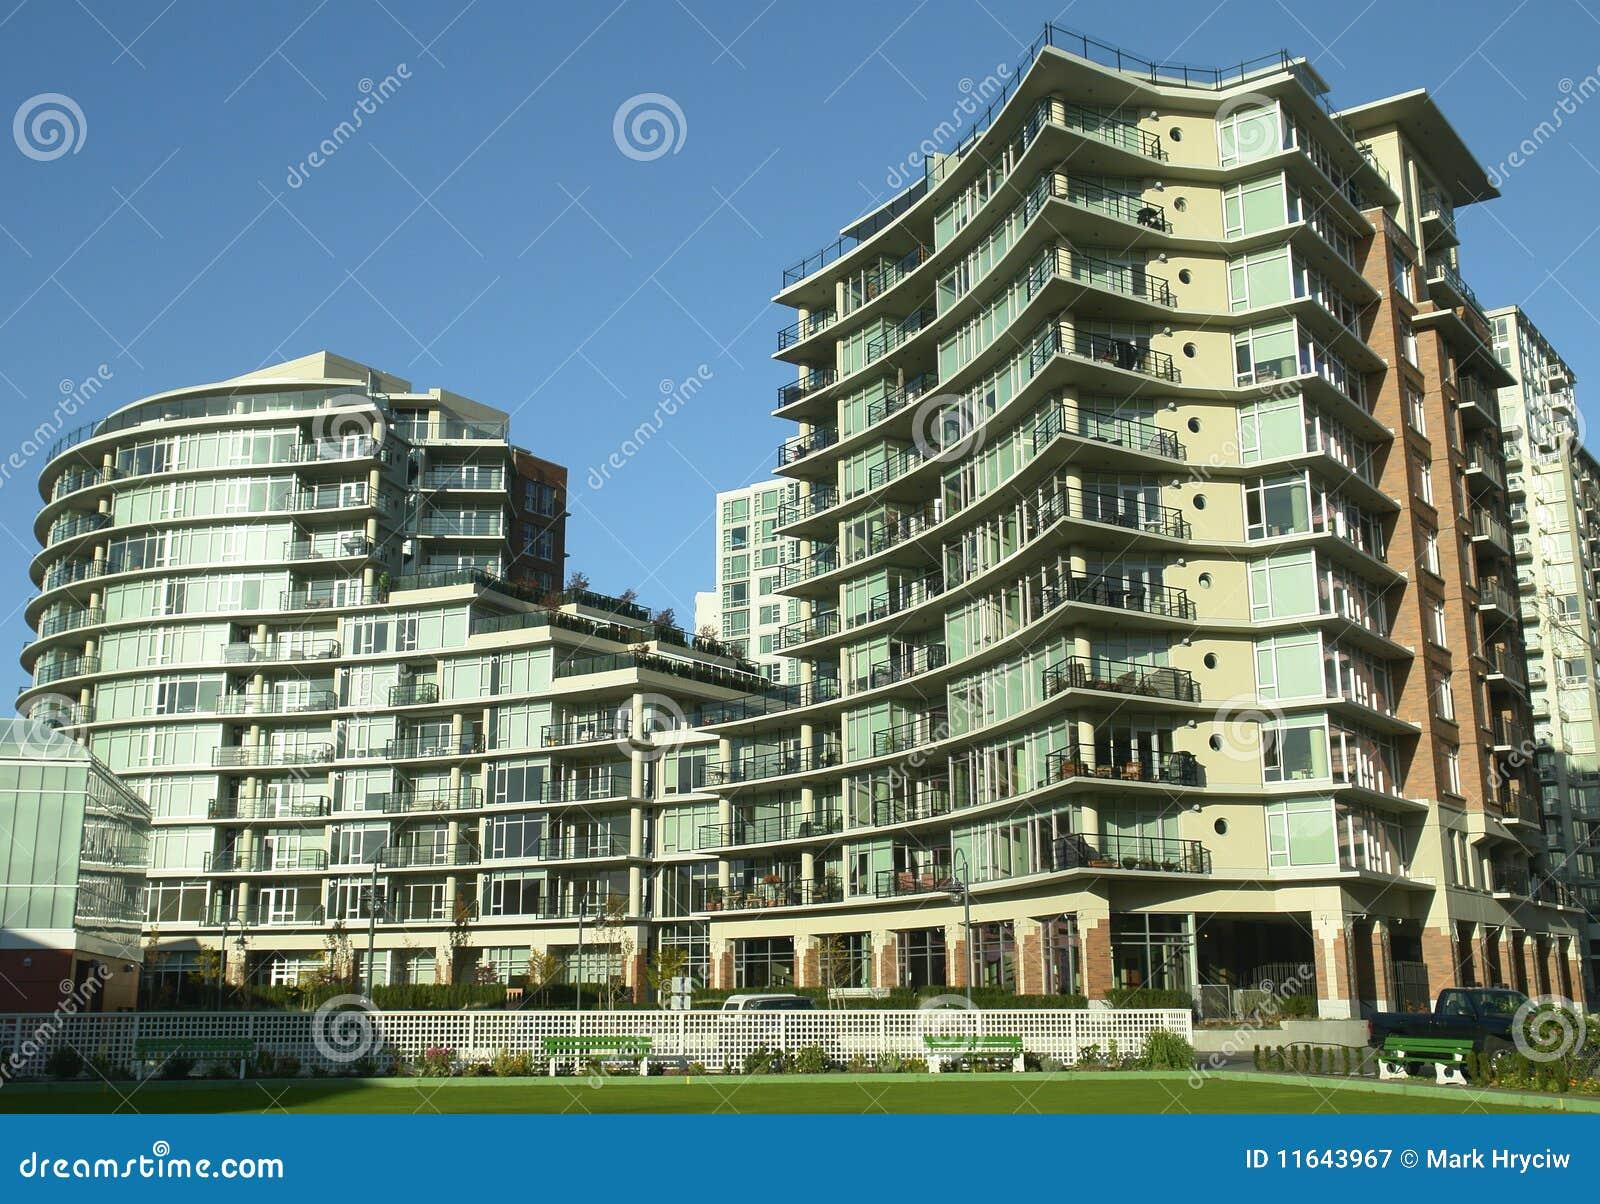 New Condominium Victoria Bc Royalty Free Stock Photography